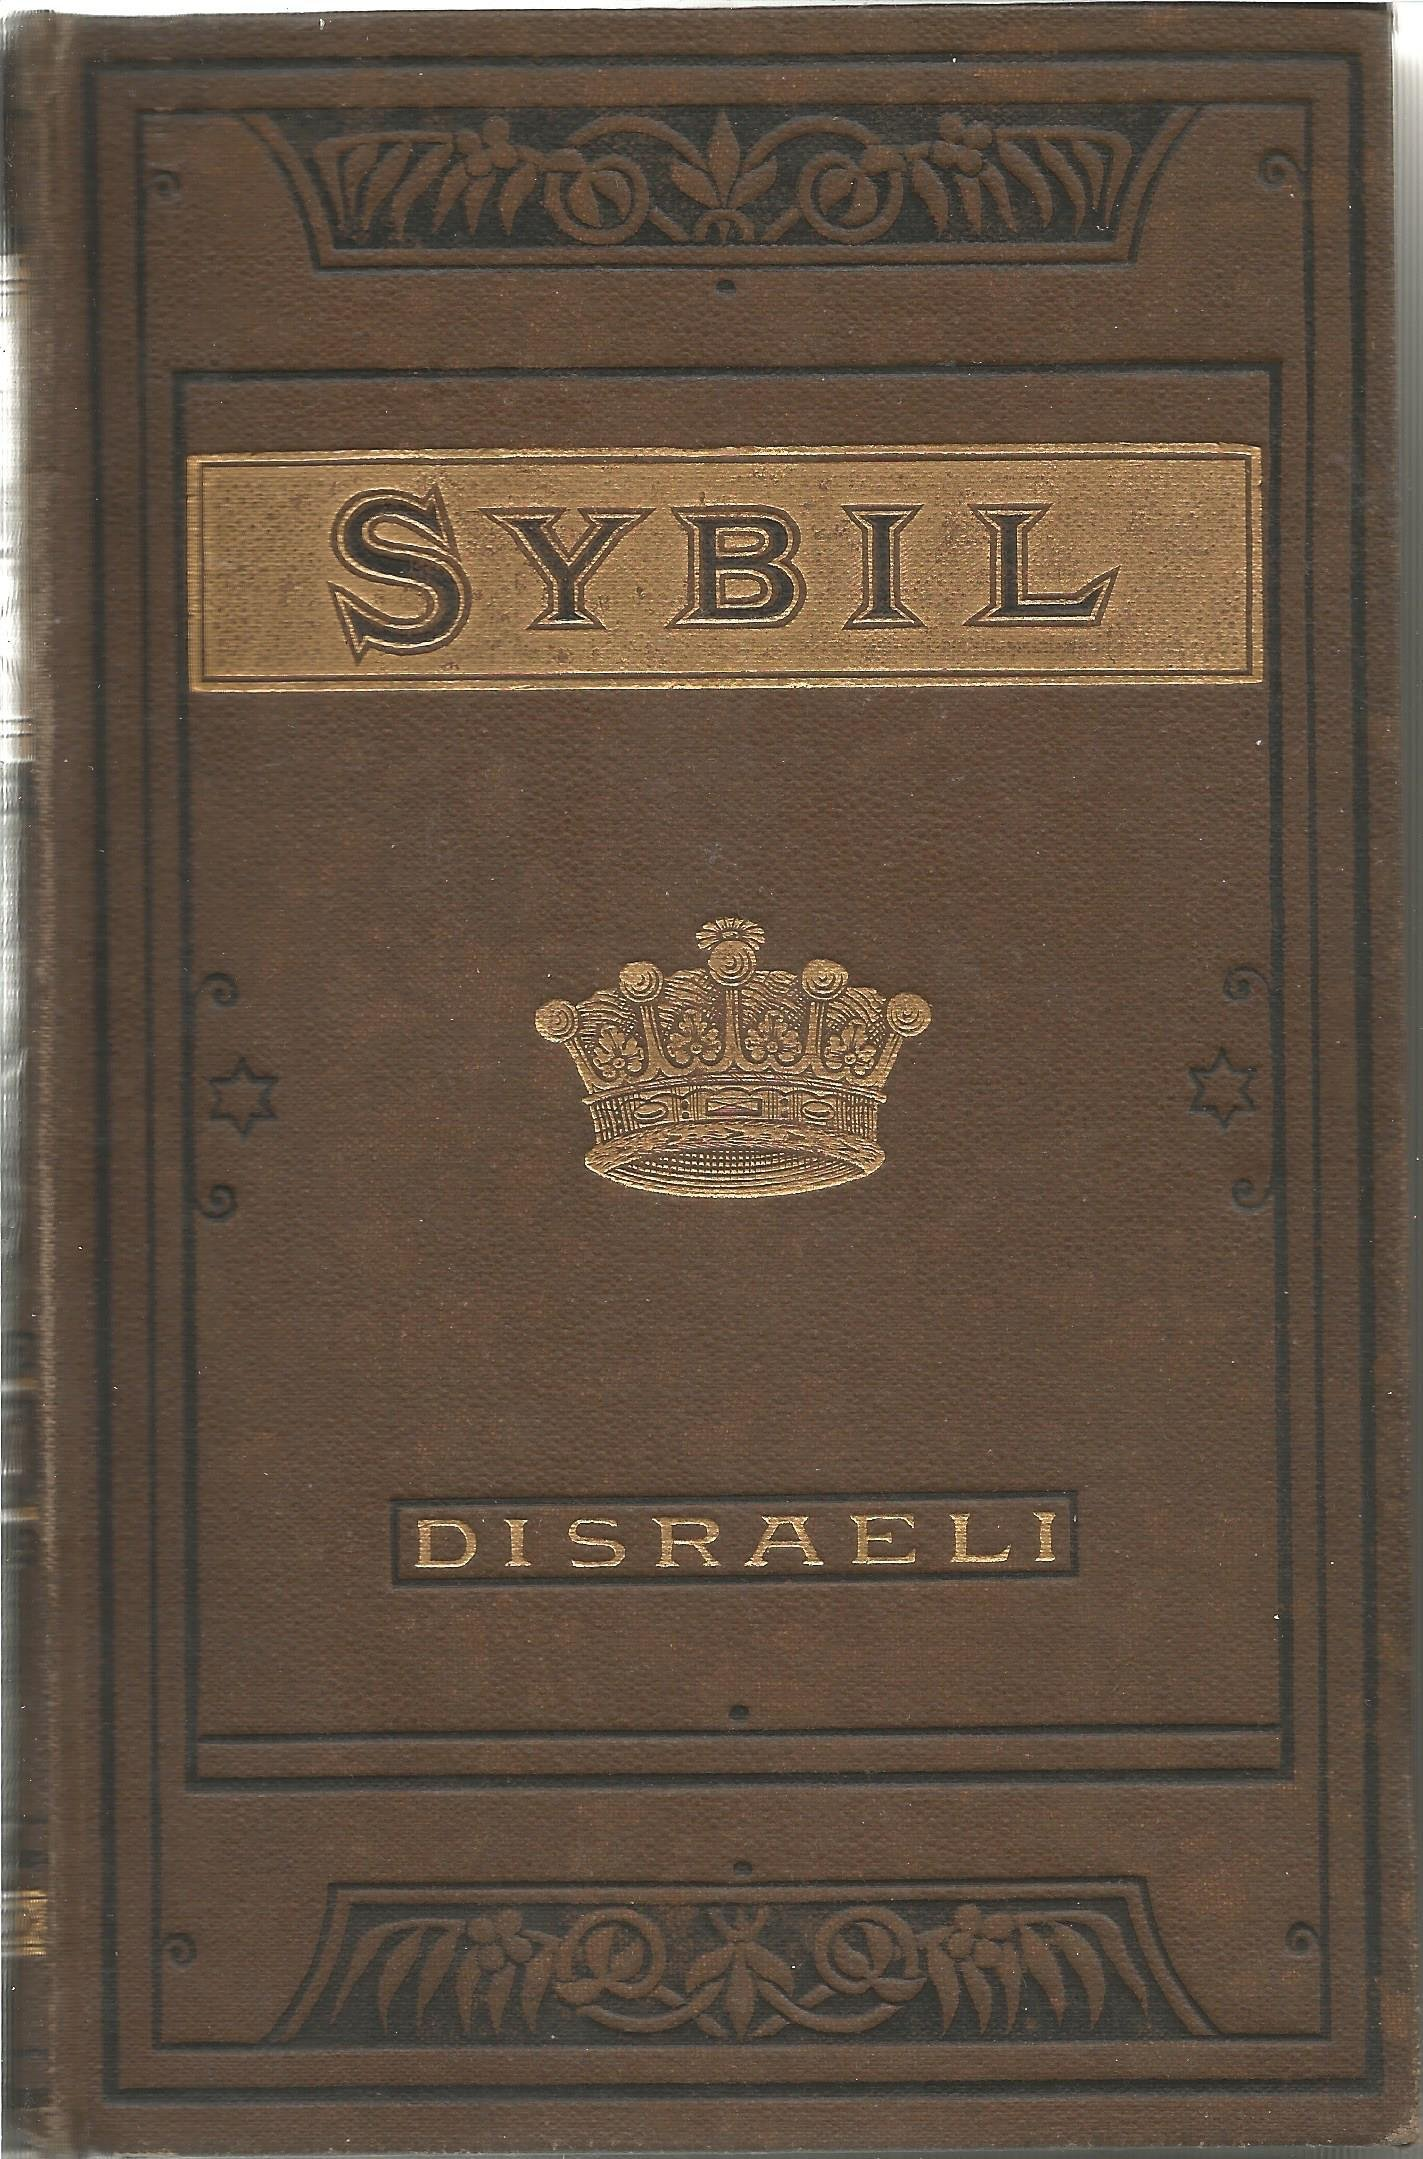 Sybil hardback book. New edition. Good Condition. All